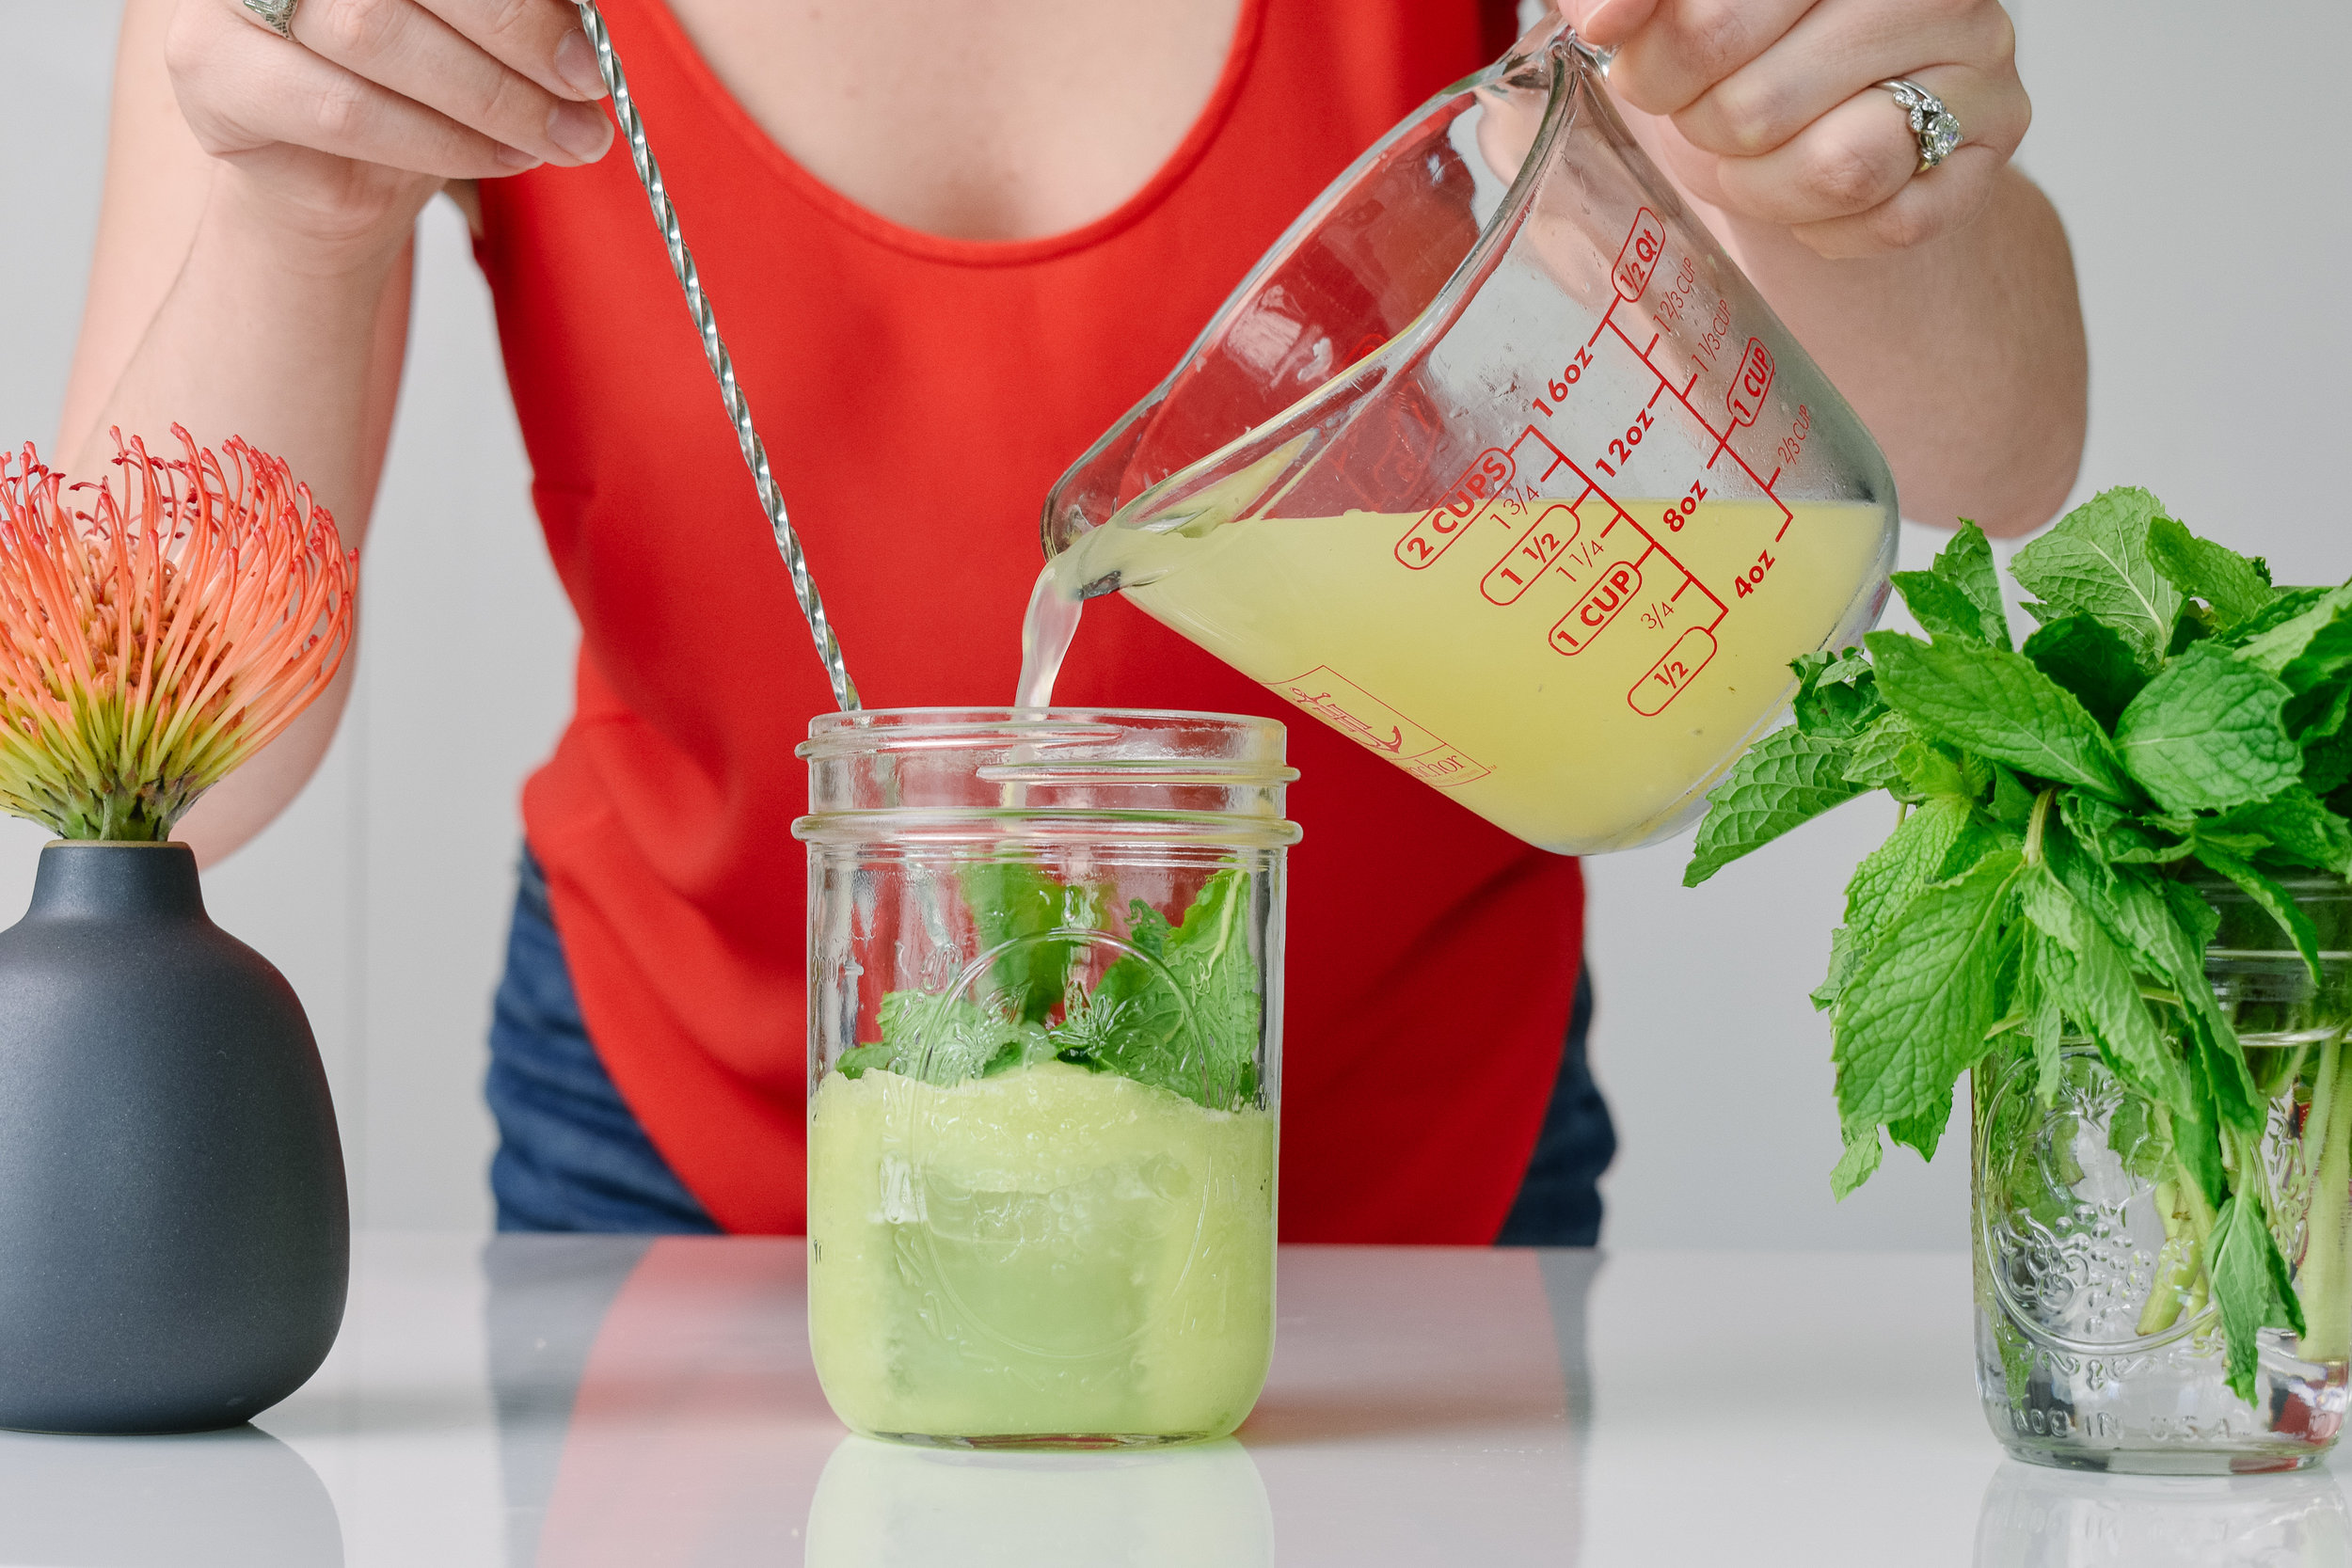 Zero-proof cucumber mint spritzer mocktail